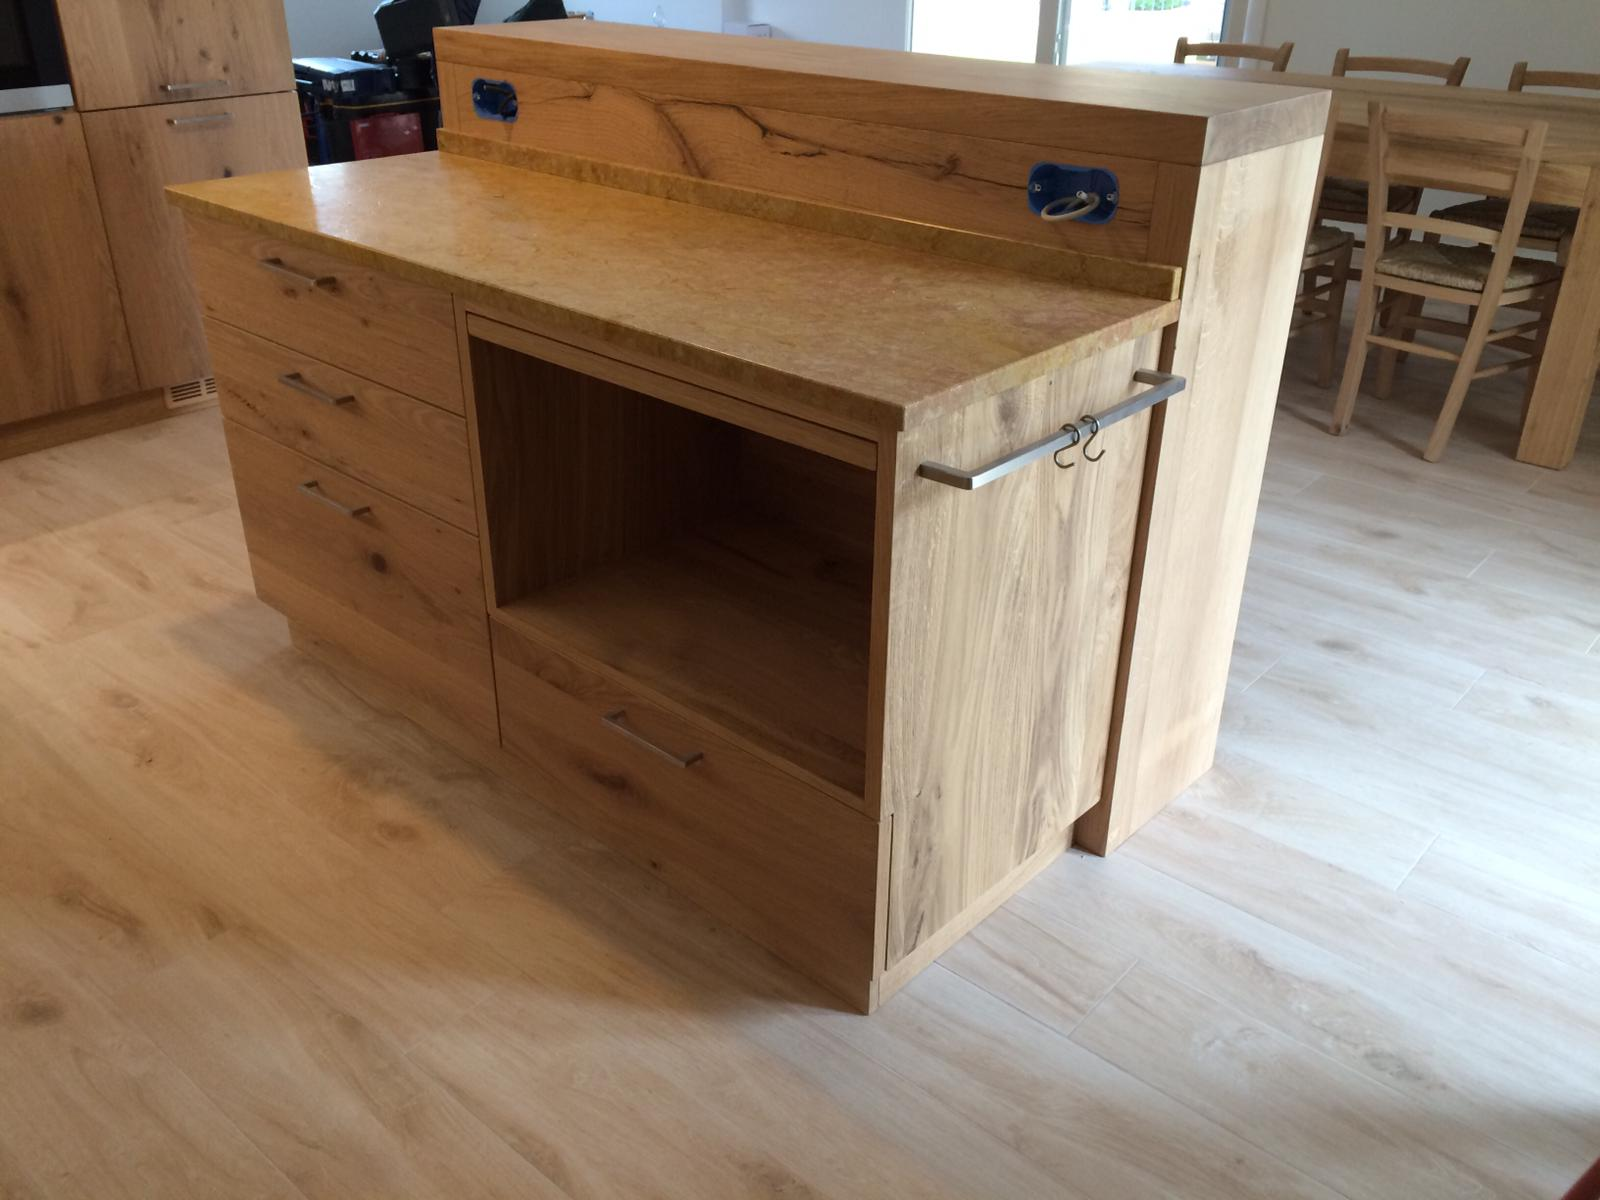 Isola in legno per cucina.